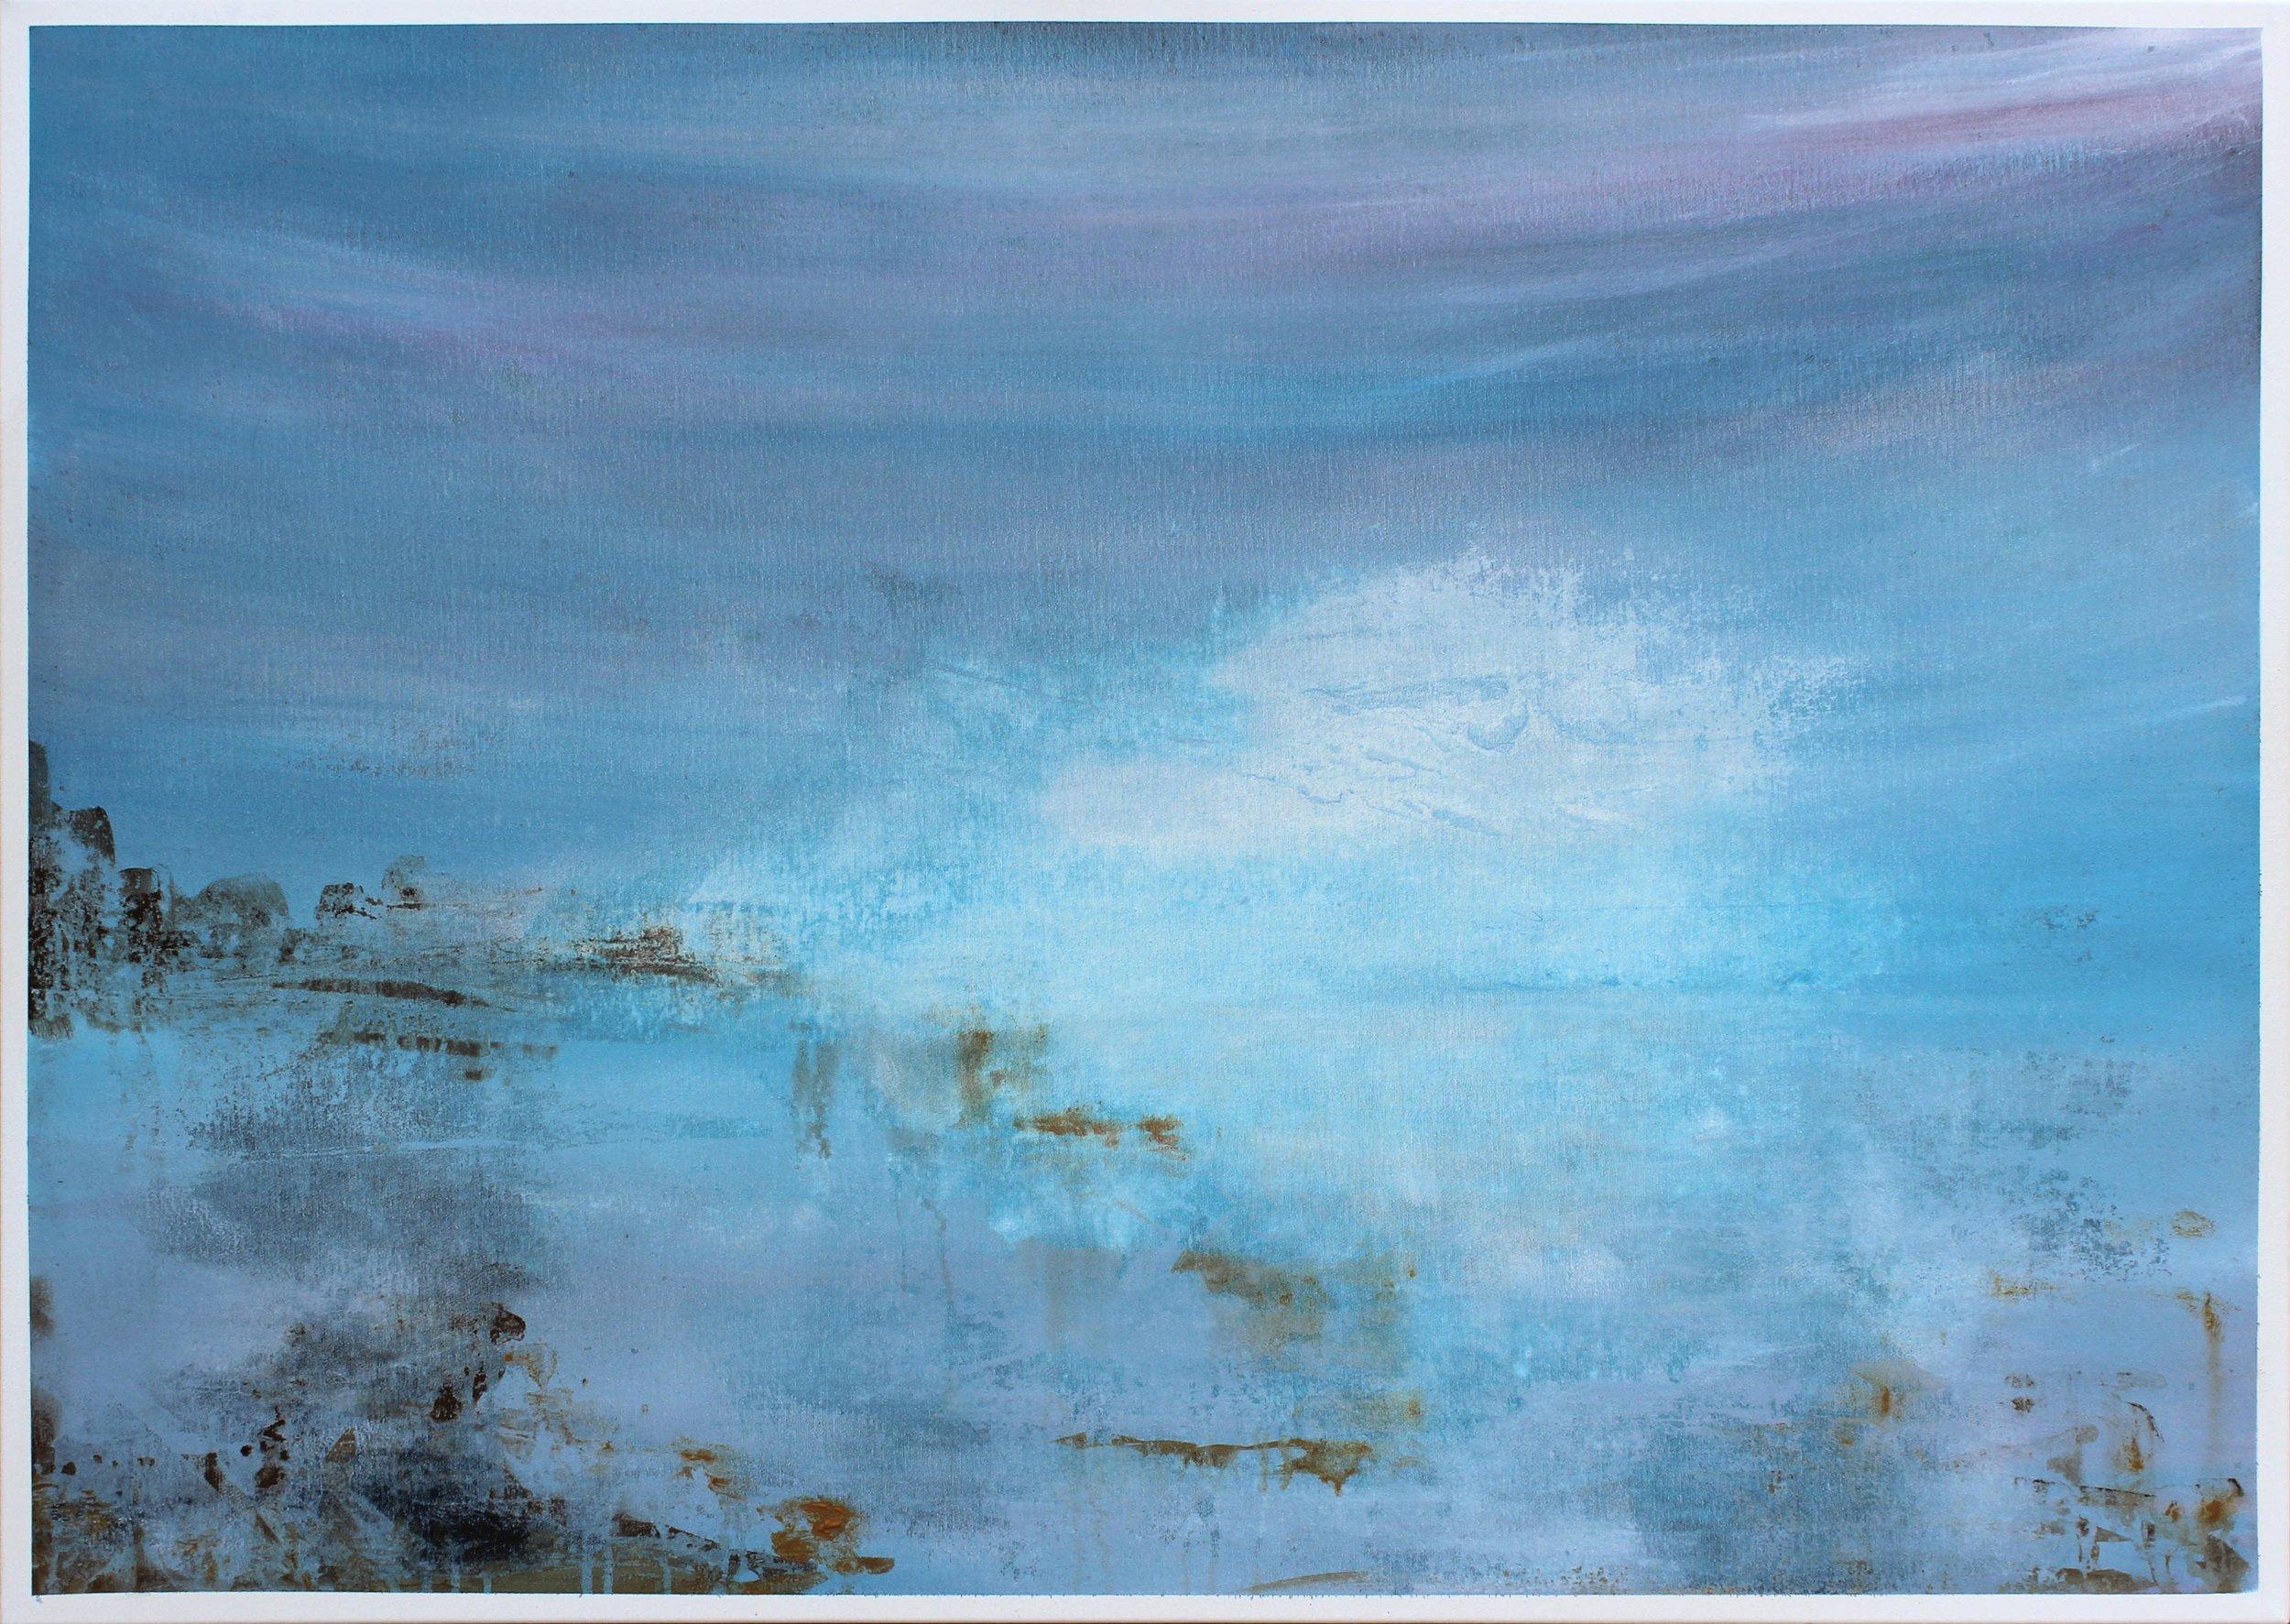 3. GALLAGHER_Martin_White Cloud on Blue Horizon_107cmx76cm_Acrylic on Canvas.jpg